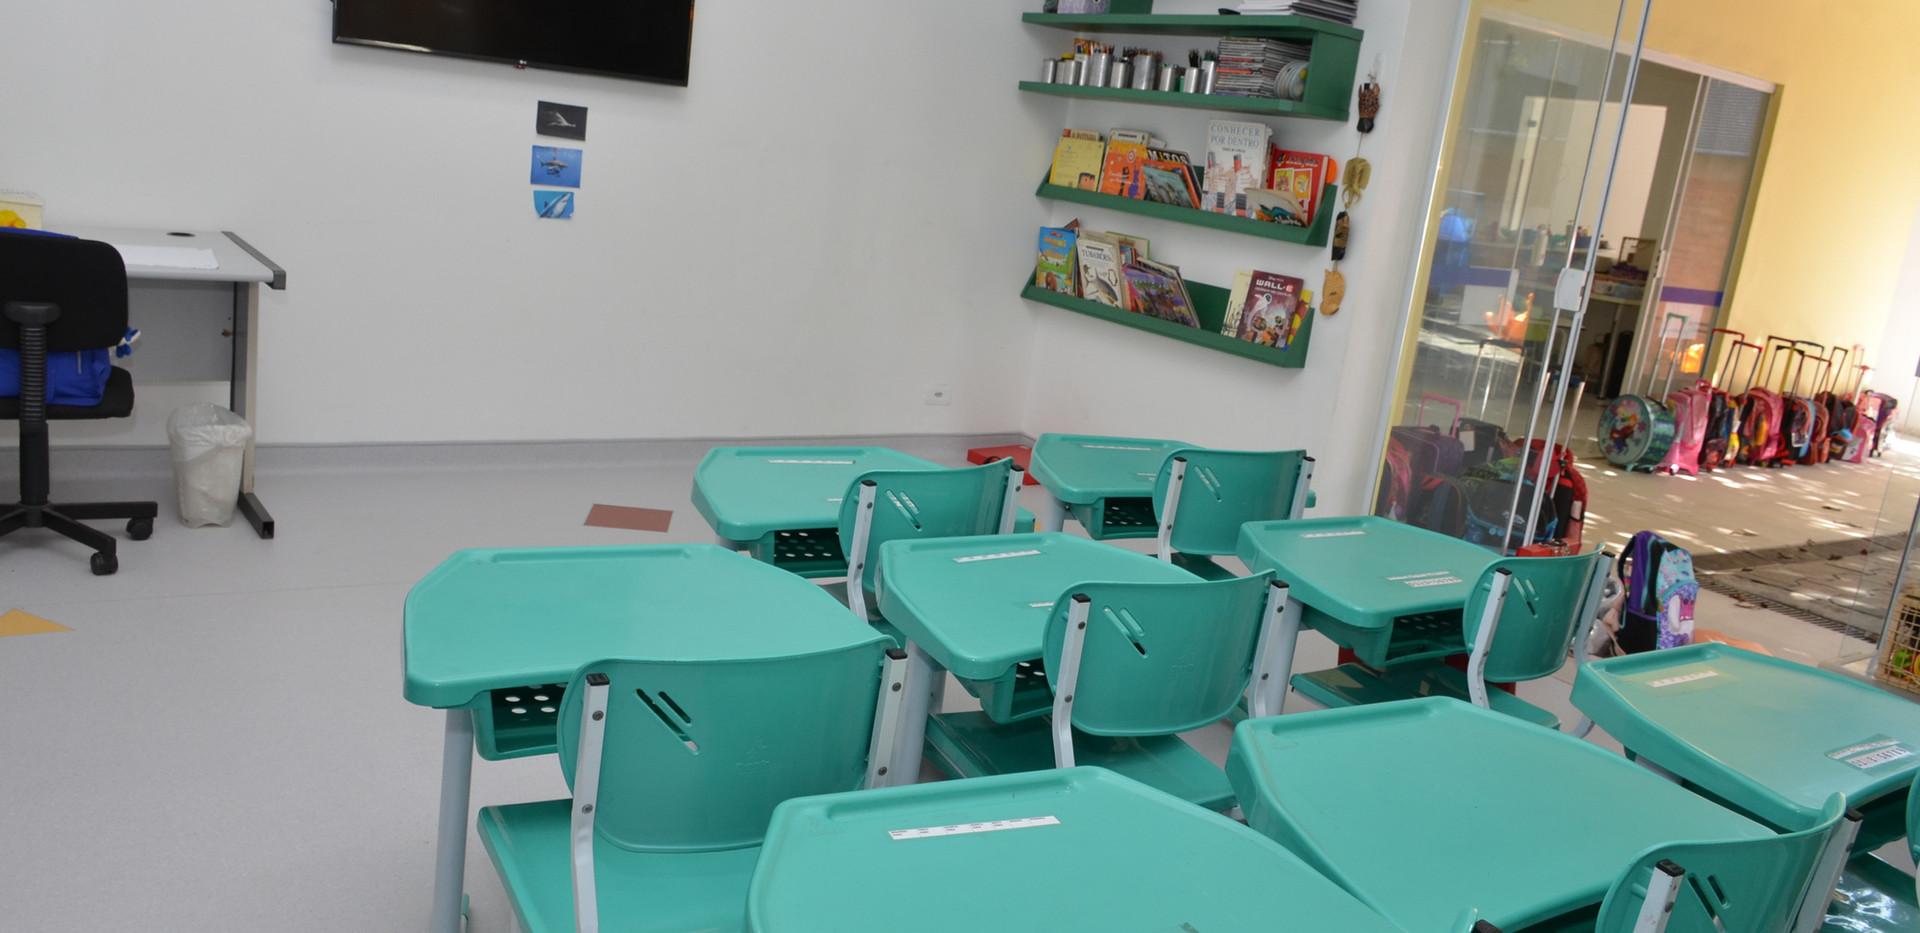 escola-infantil-moema-16.JPG